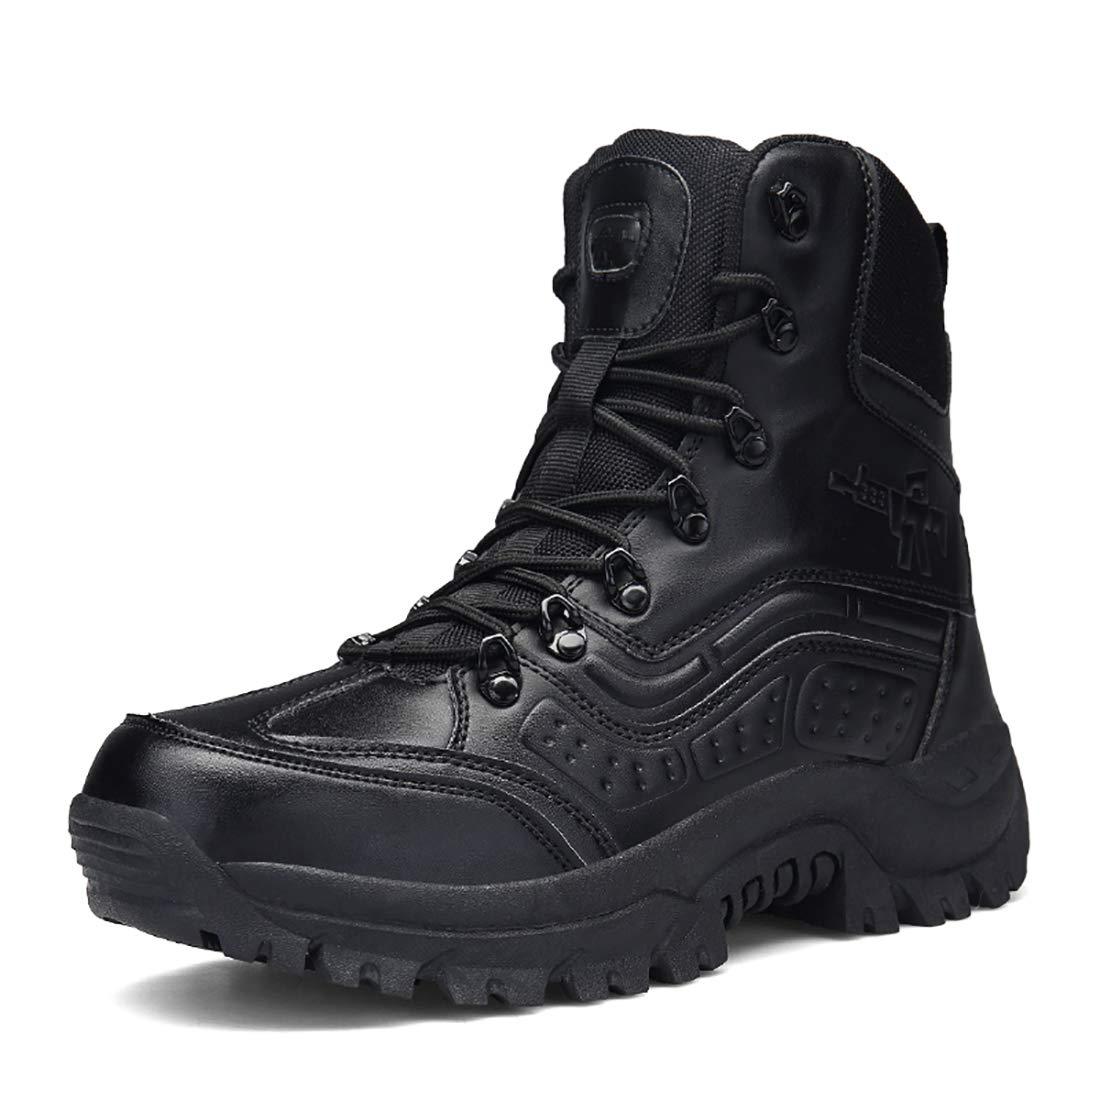 FKMI Steifel Herren Wanderschuhe Damen Trekkingschuhe Armee Combat Tactical Stiefel Einsatzstiefel Kampfstiefel